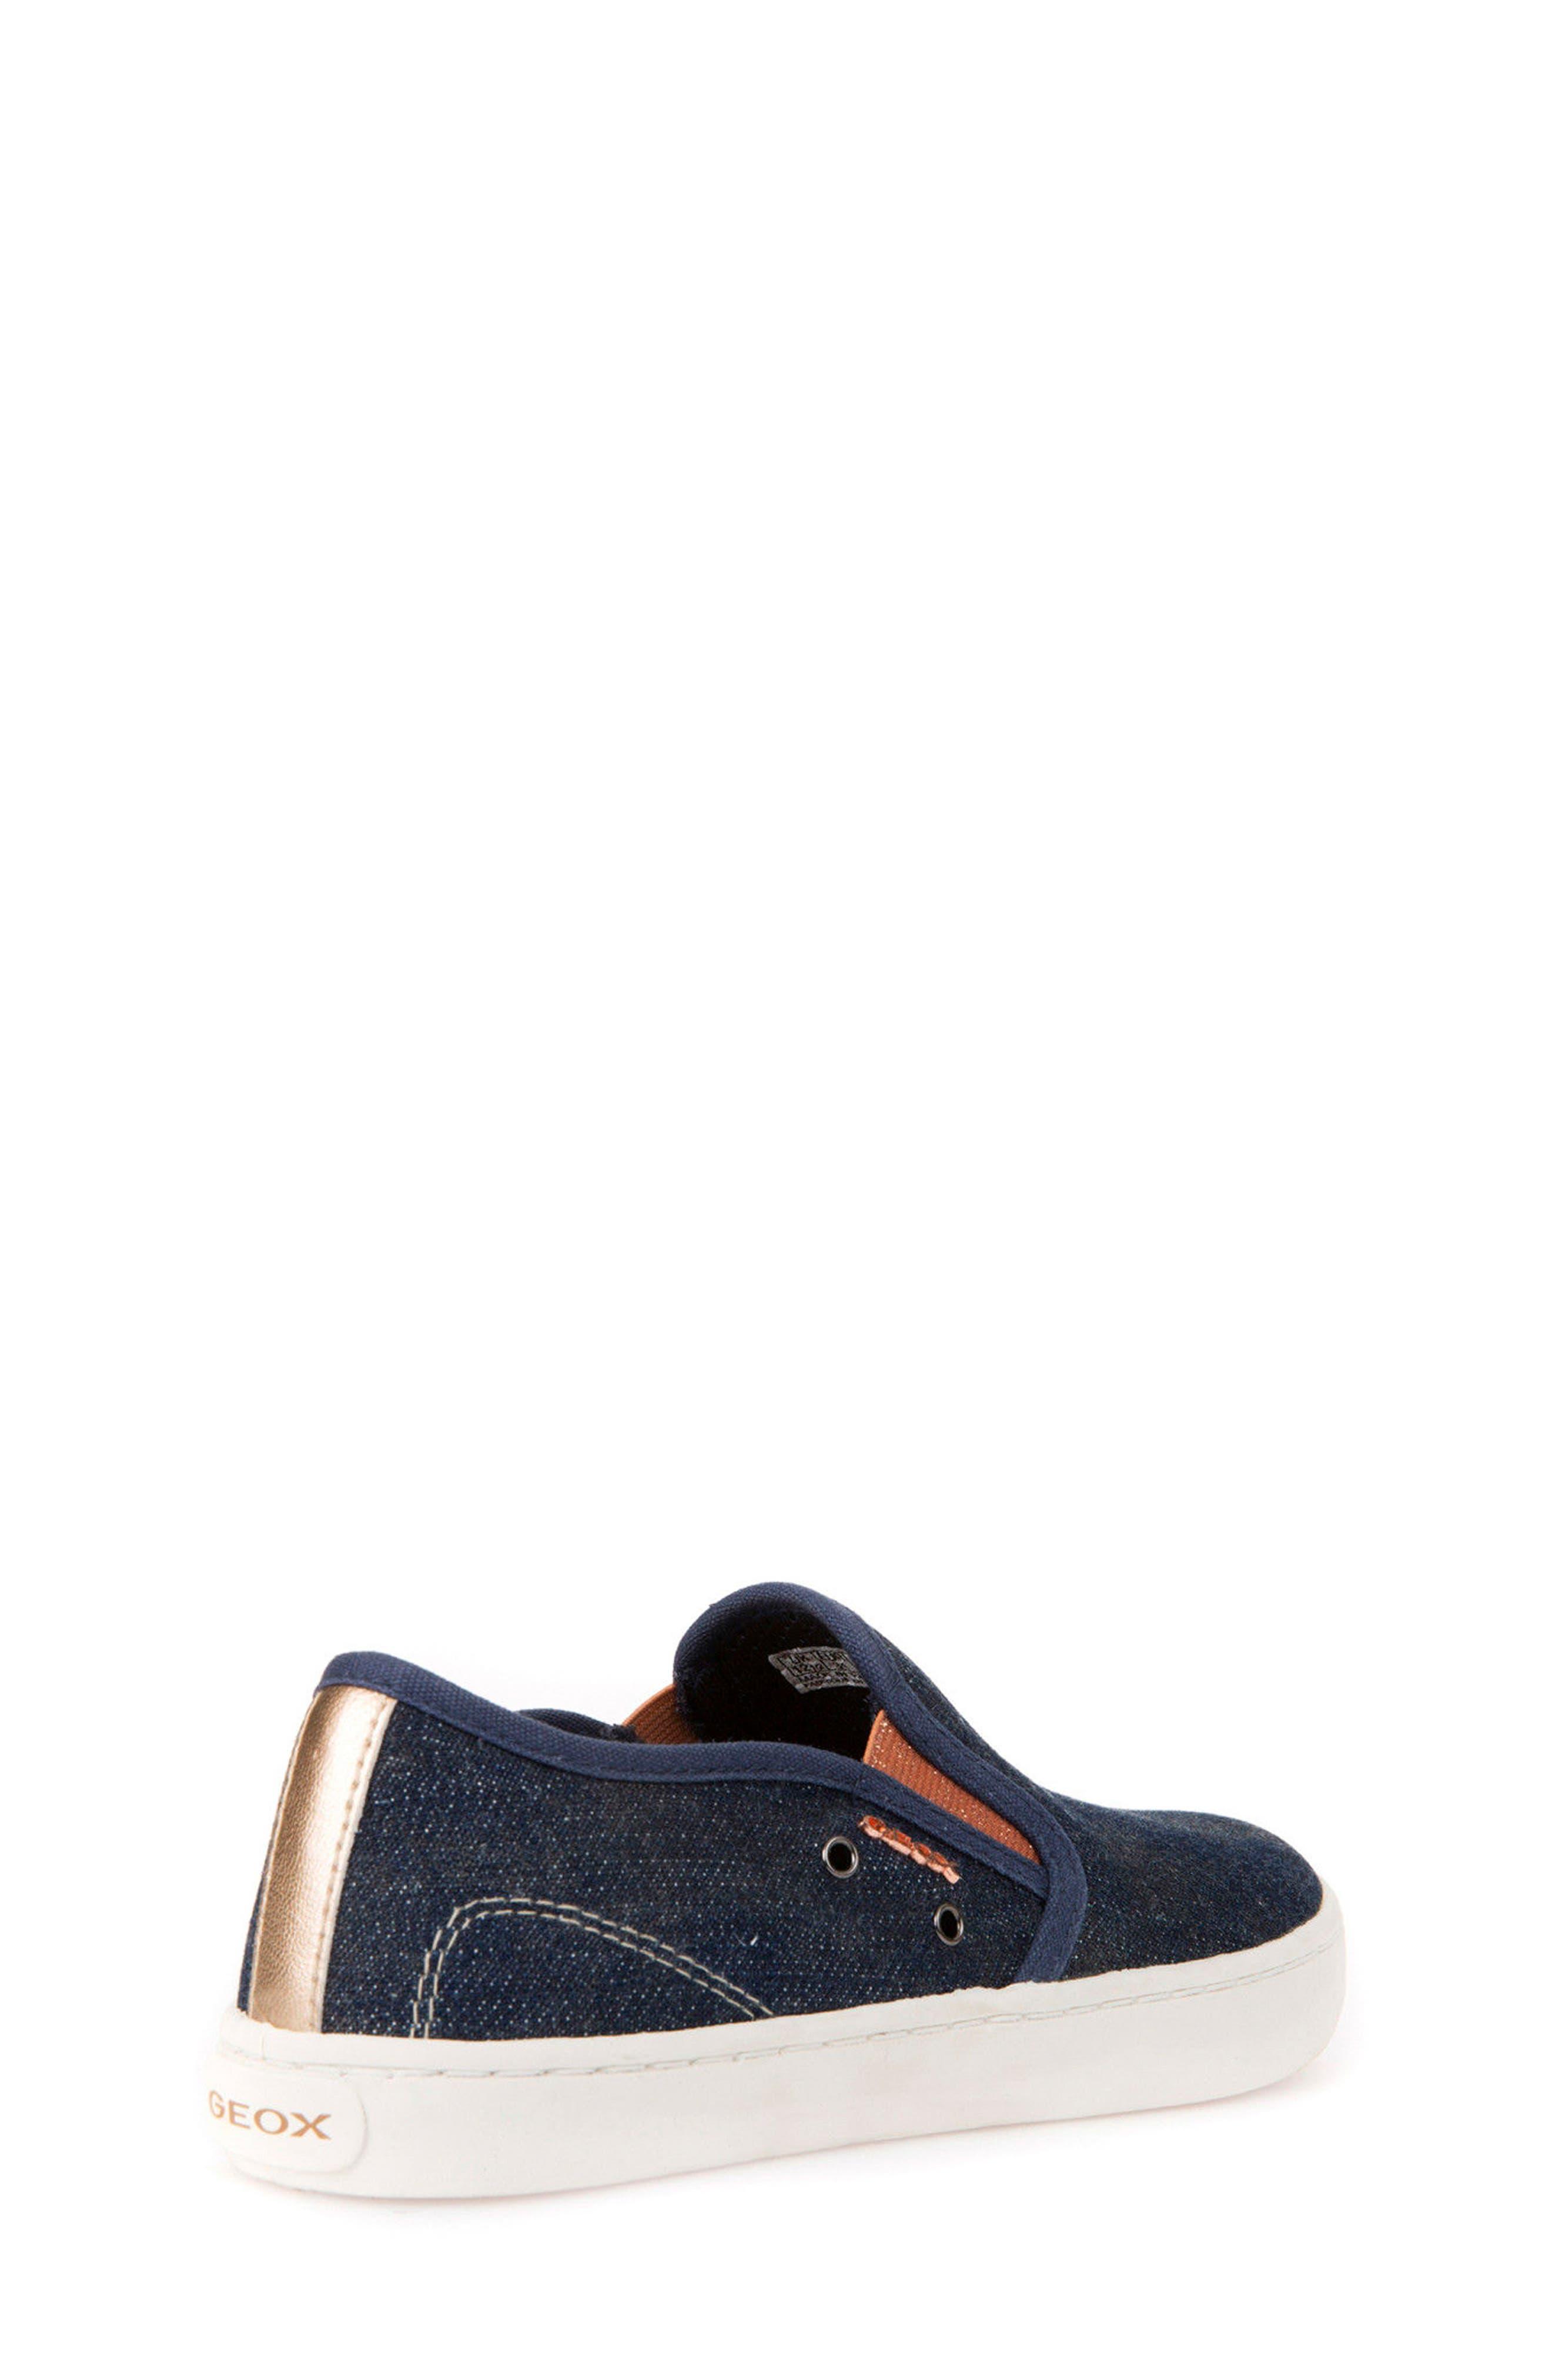 Jr Kiwi Slip-On Waterproof Sneaker,                             Alternate thumbnail 7, color,                             JEANS